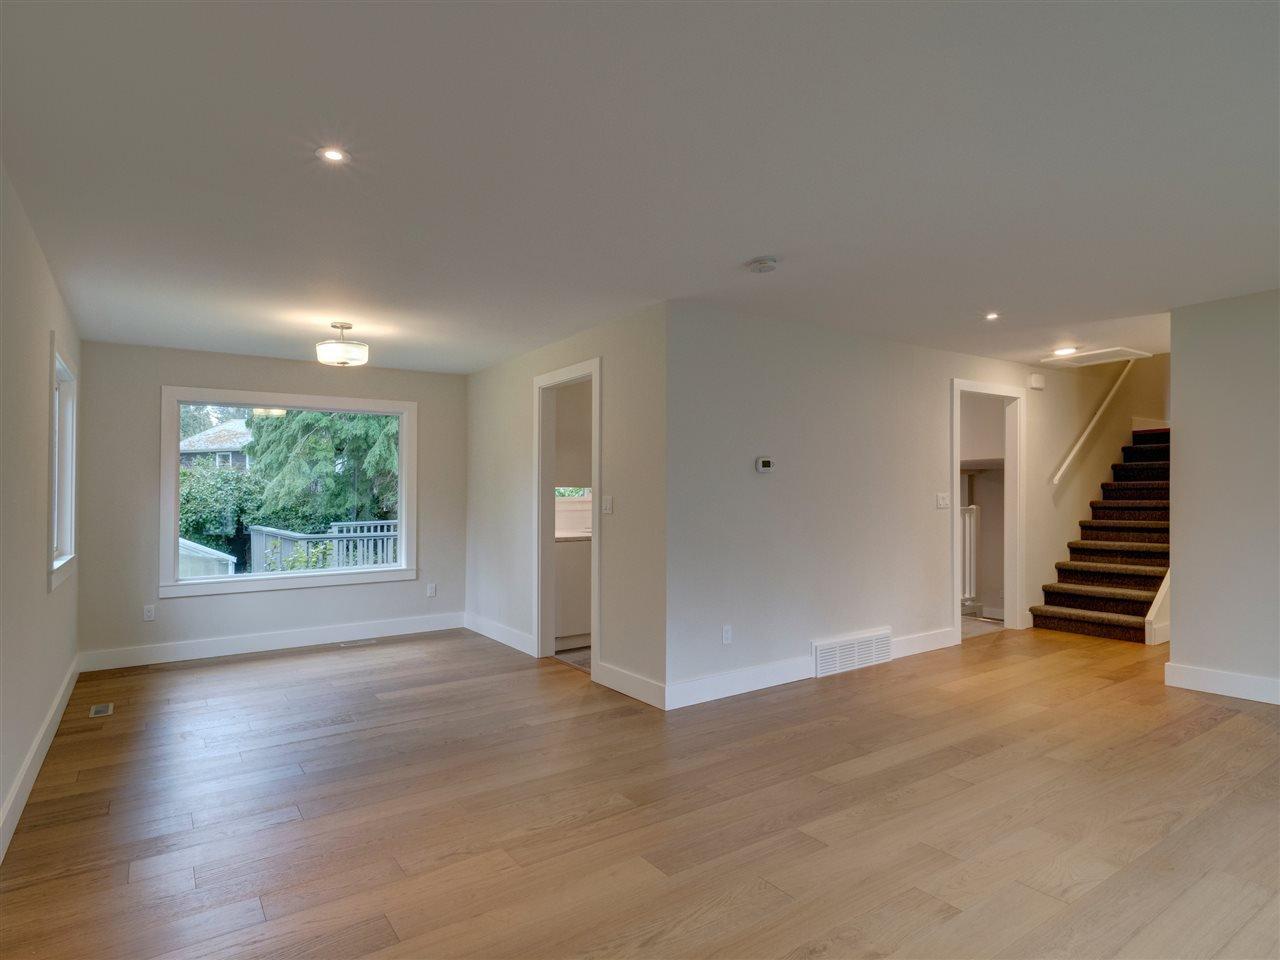 Photo 9: Photos: 1085 ROBERTS CREEK Road: Roberts Creek House for sale (Sunshine Coast)  : MLS®# R2392415